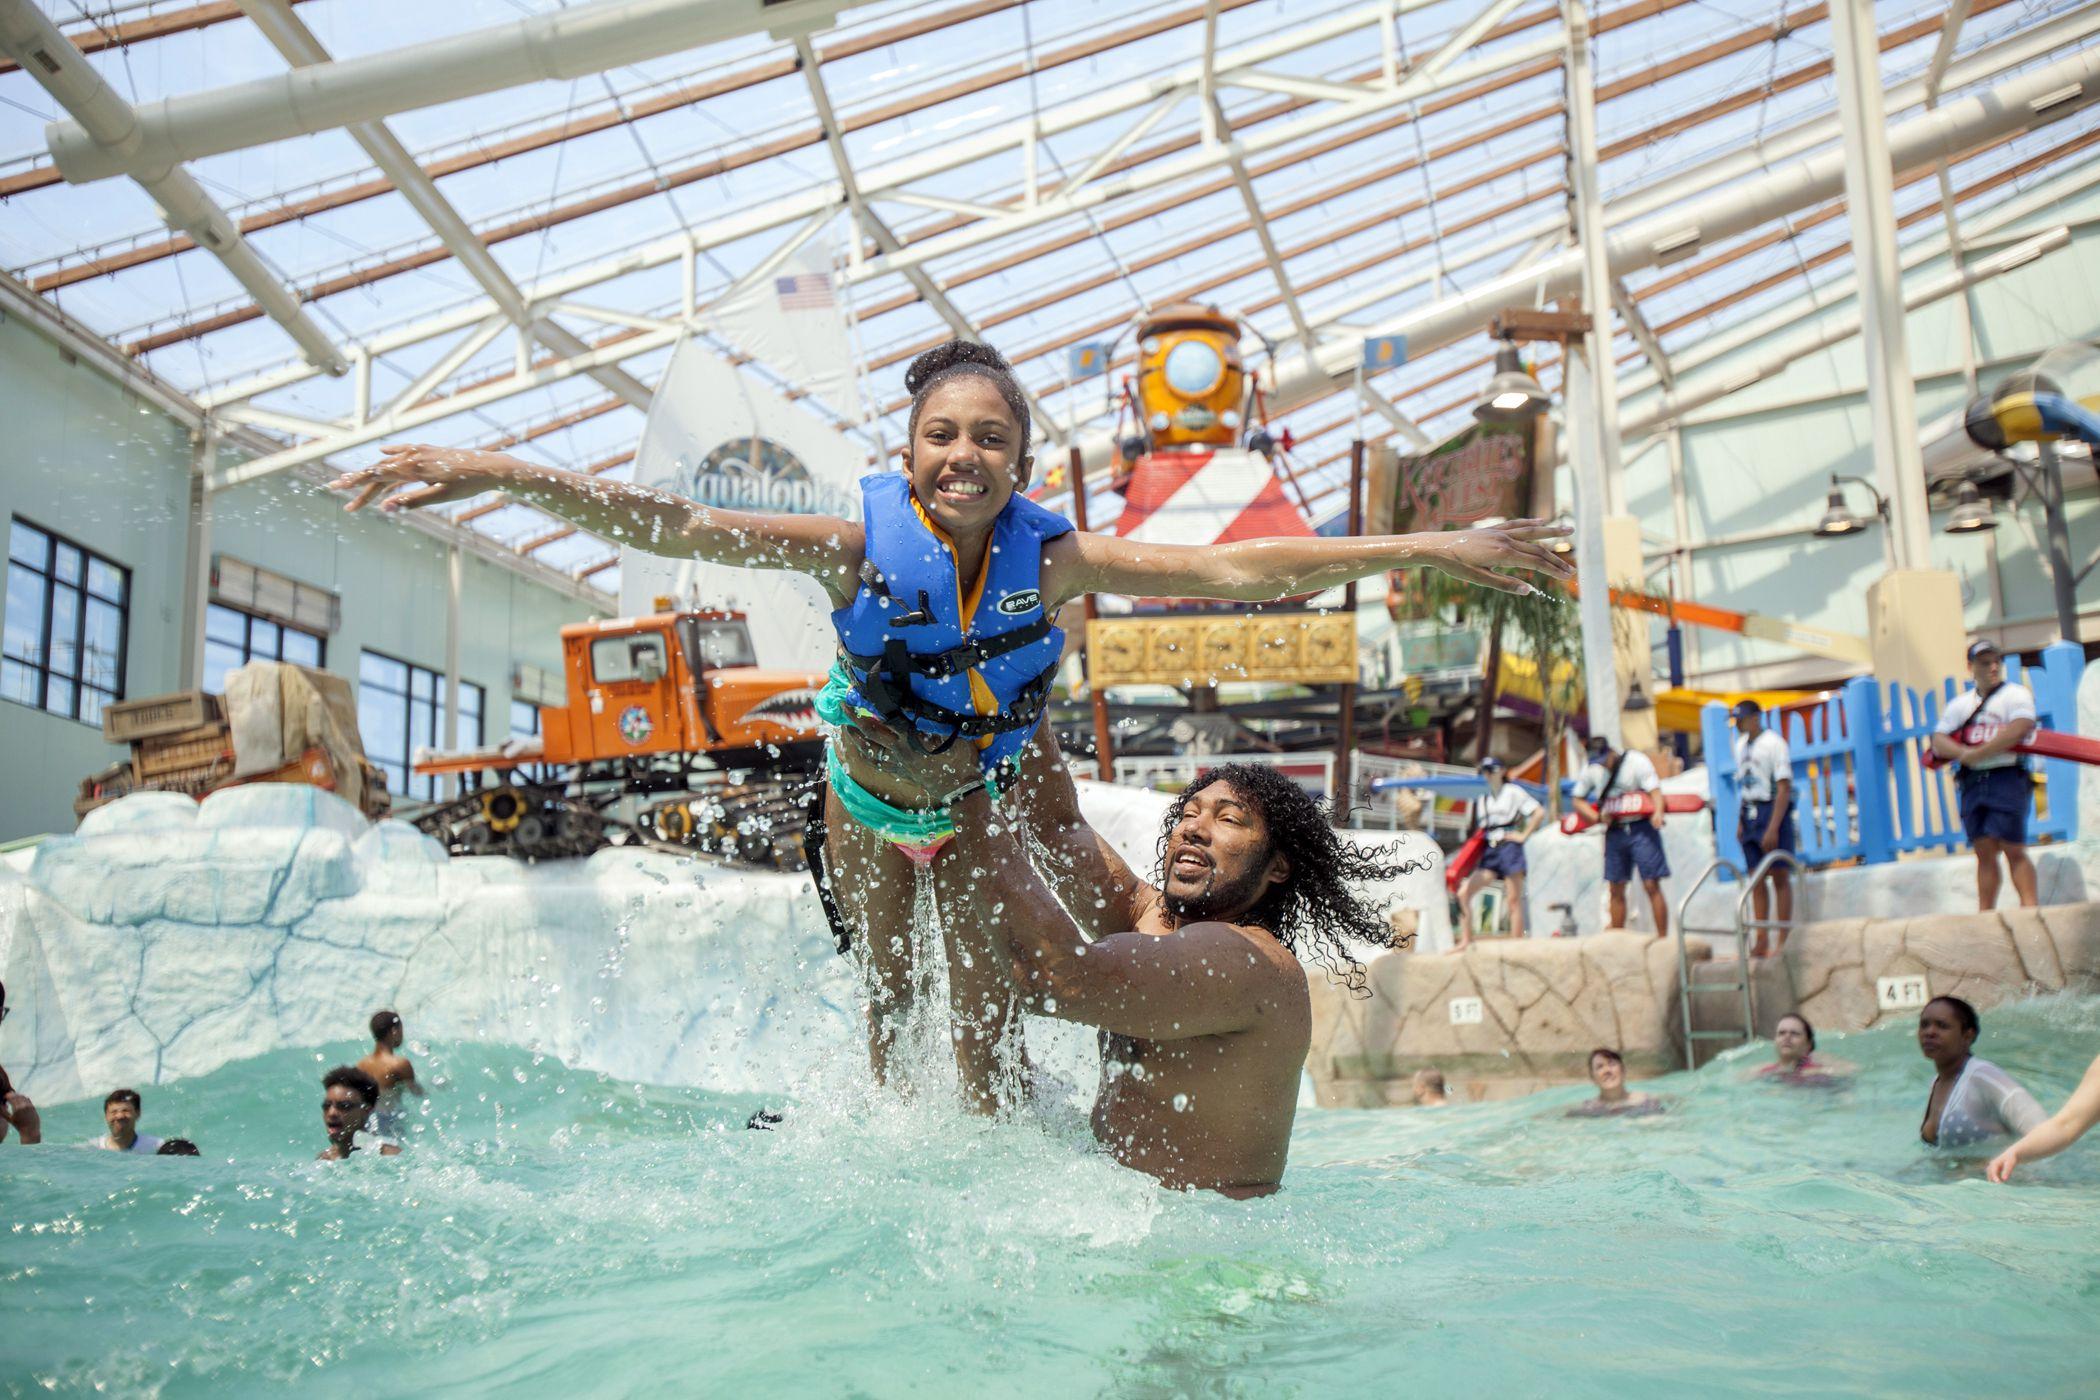 Camelback Lodge Aquatopia Indoor Waterpark